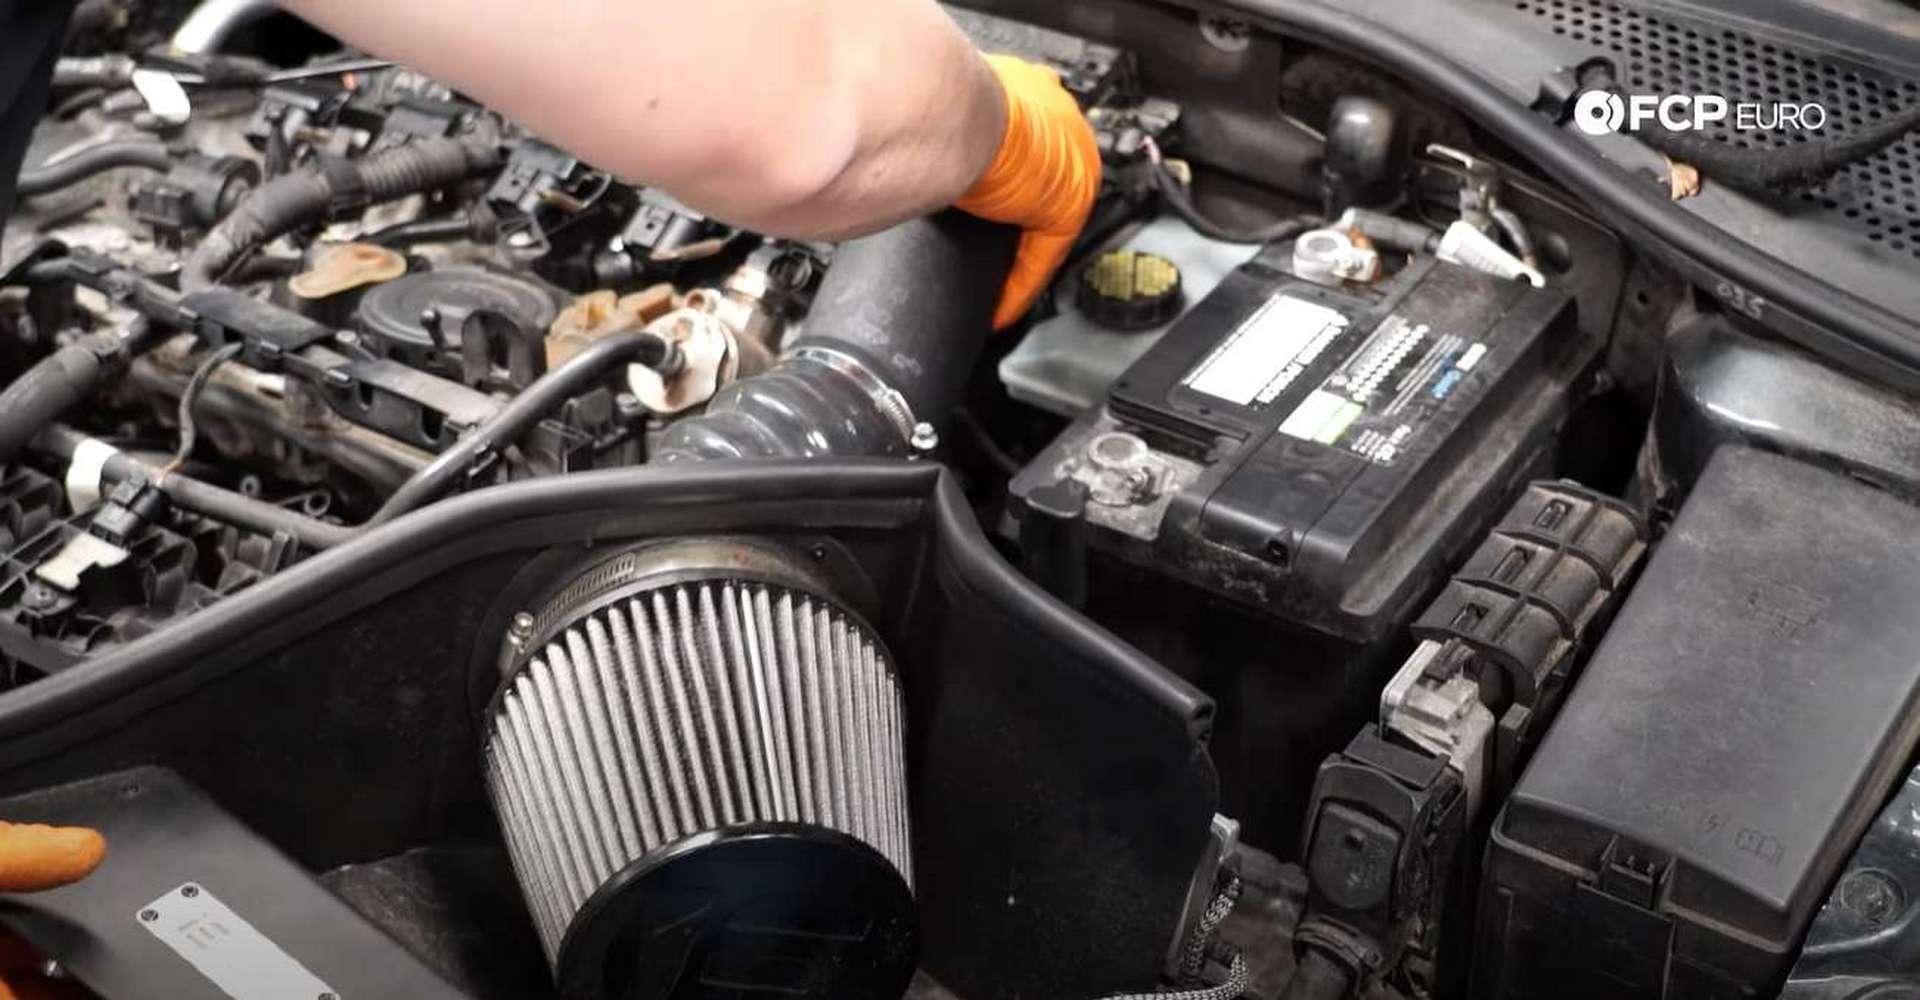 DIY MK7 VW GTI Turbocharger Upgrade refitting the intake